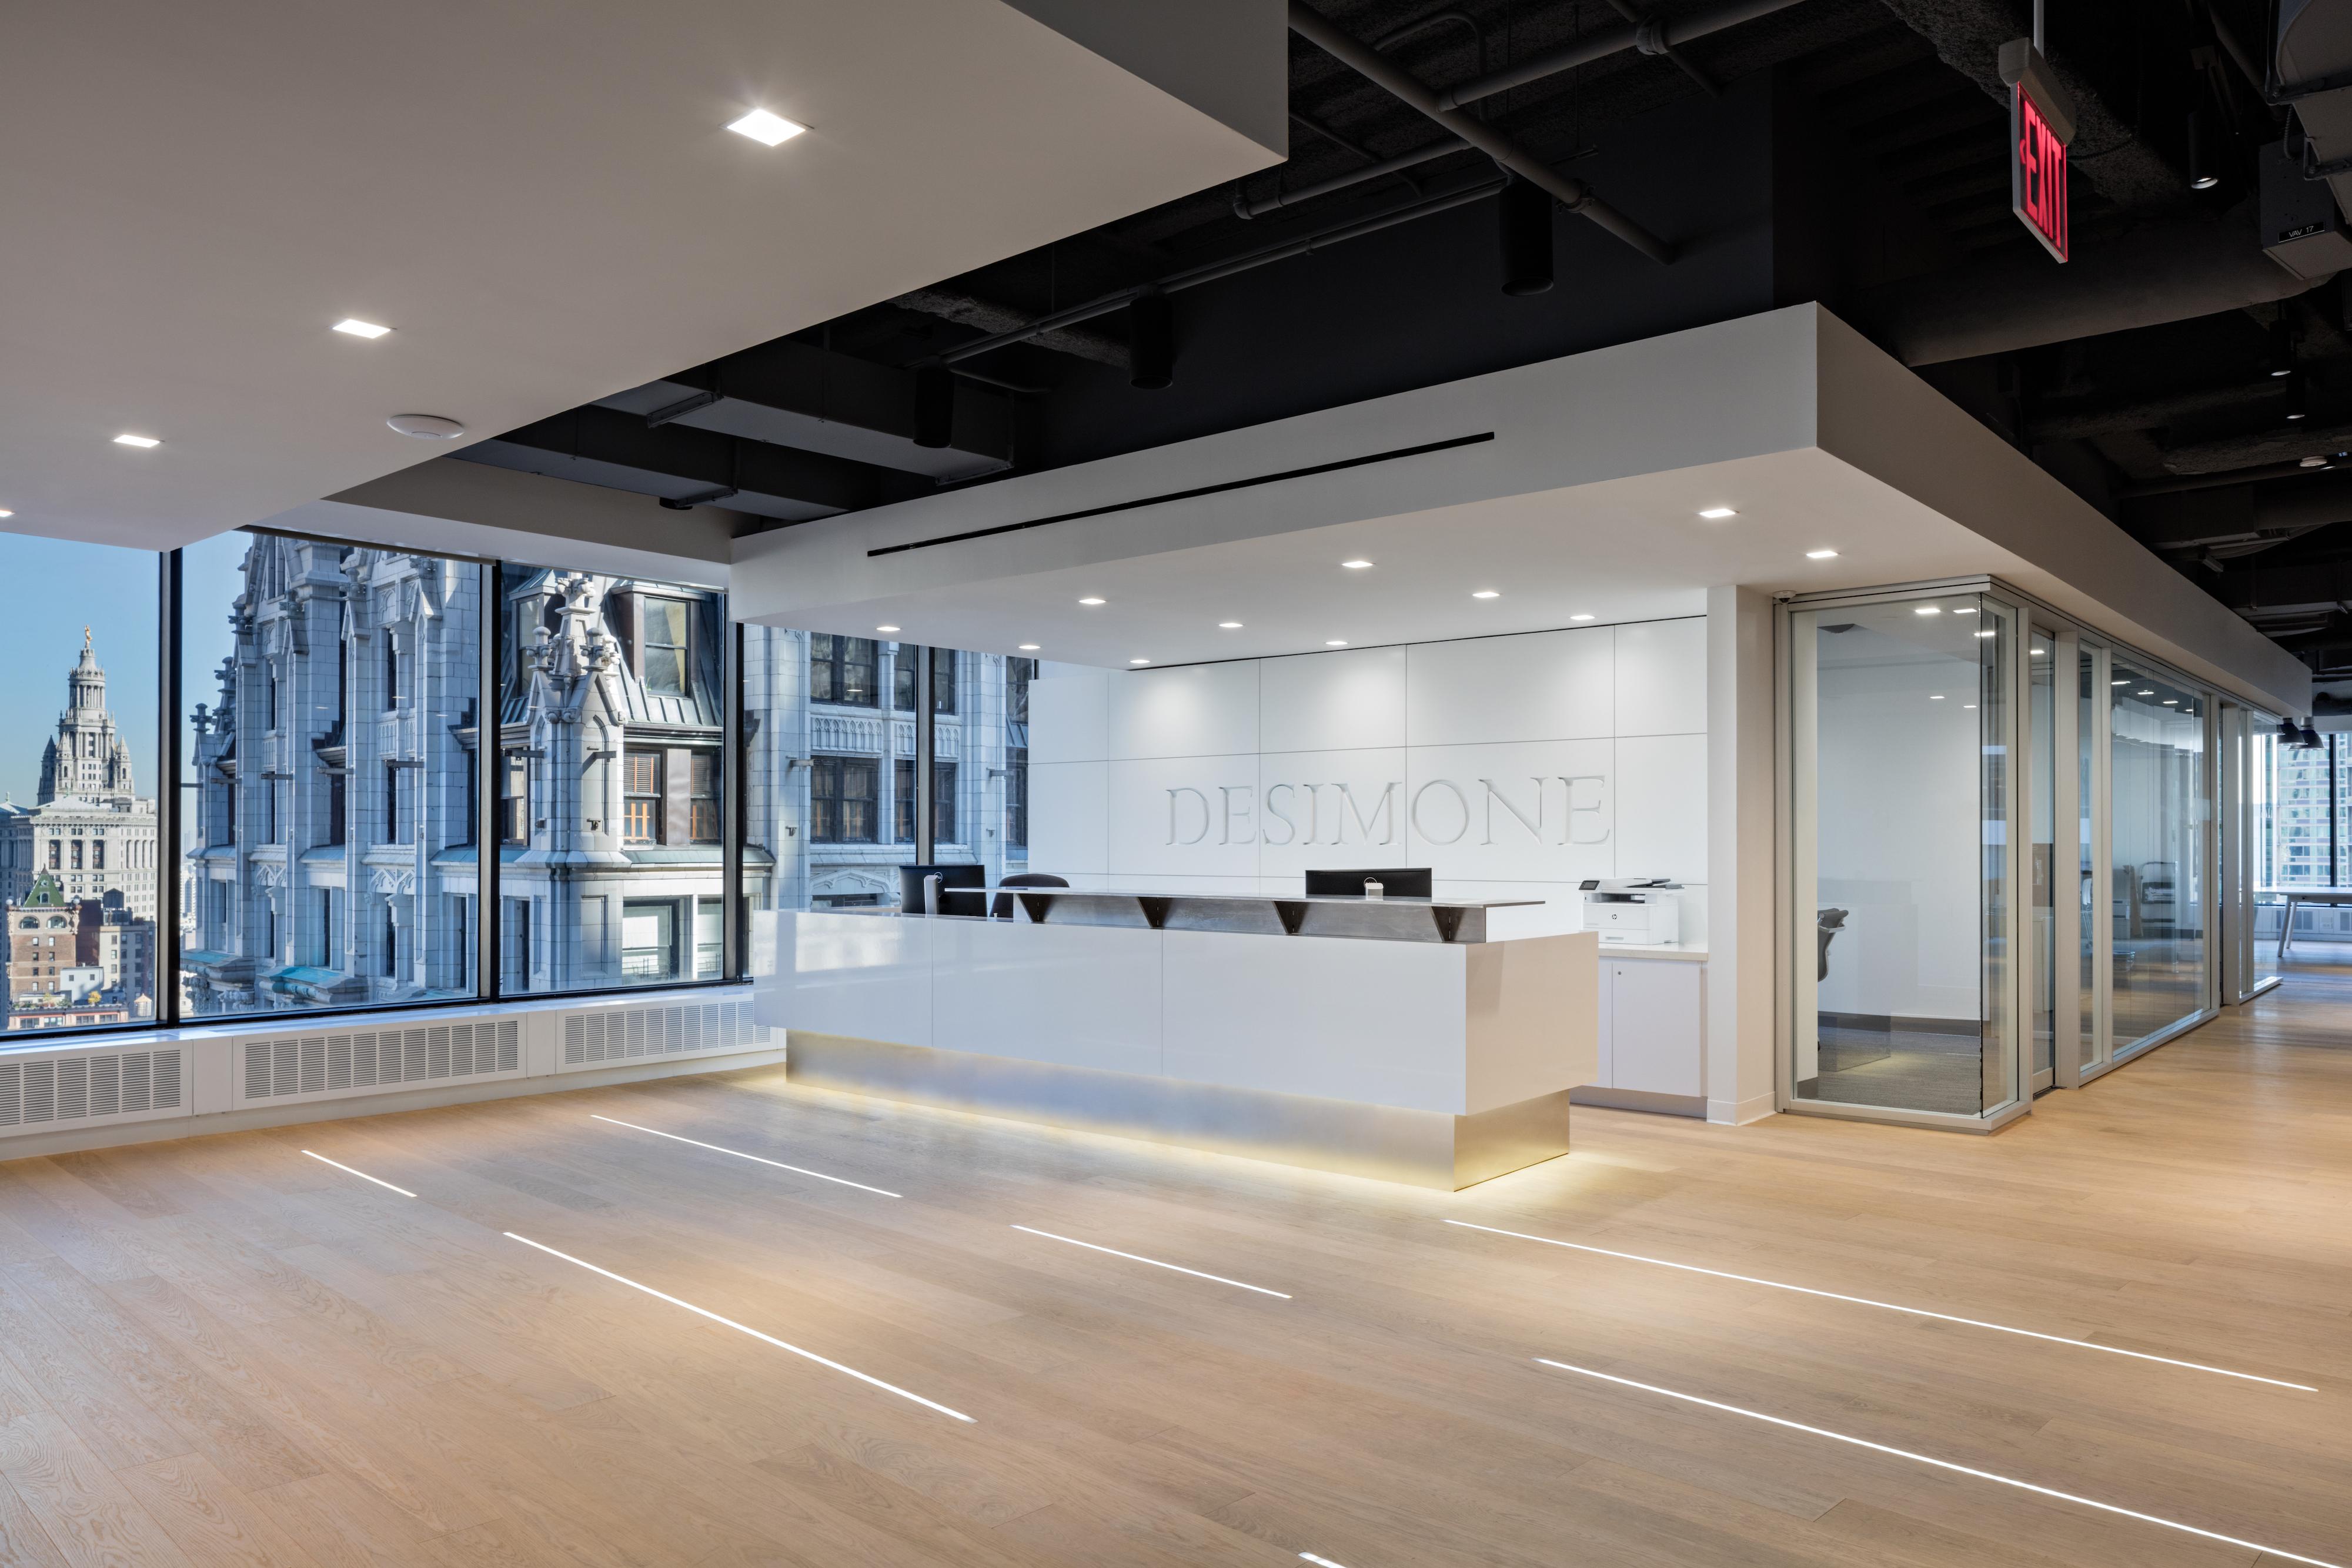 Desimone consulting engineers 39 new york city headquarters for Modern design consulting engineering office